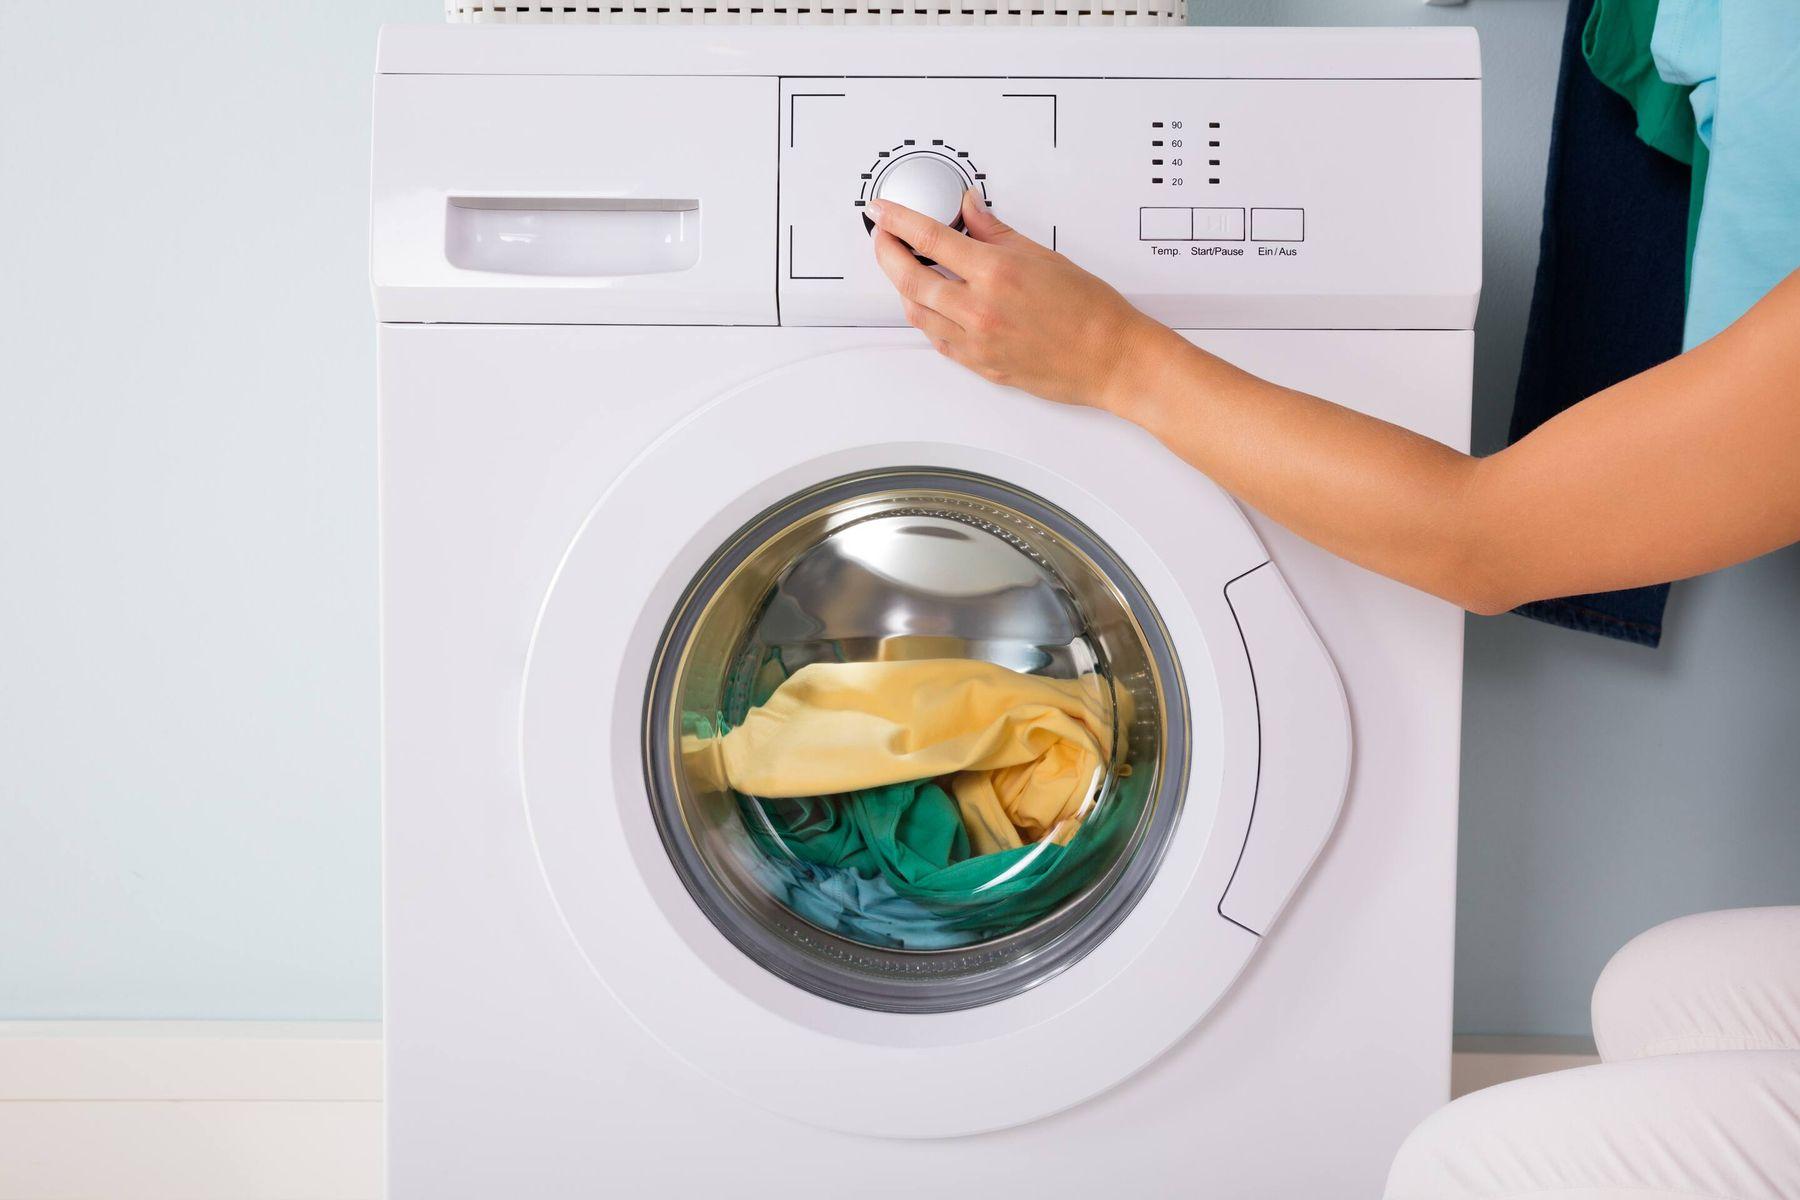 वॉशिंग मशीन खरीदने से पहले जानिए उसकी स्मार्ट सेटिंग्स | क्लीएनीपीडिया